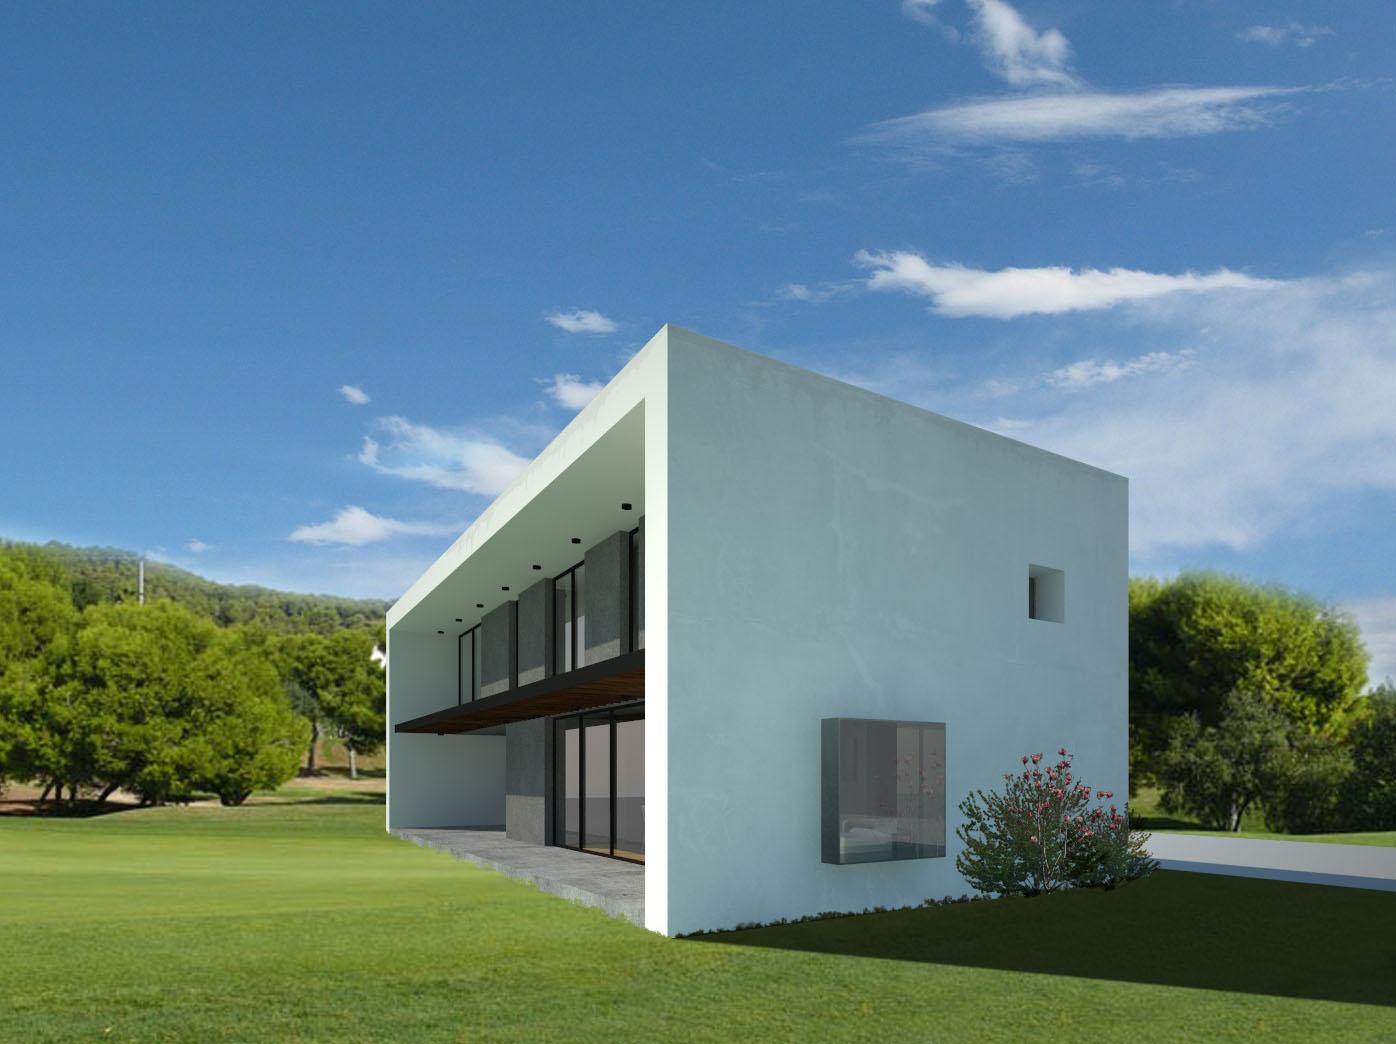 Arquitectos casa mendiolaza - Arquitectos en segovia ...